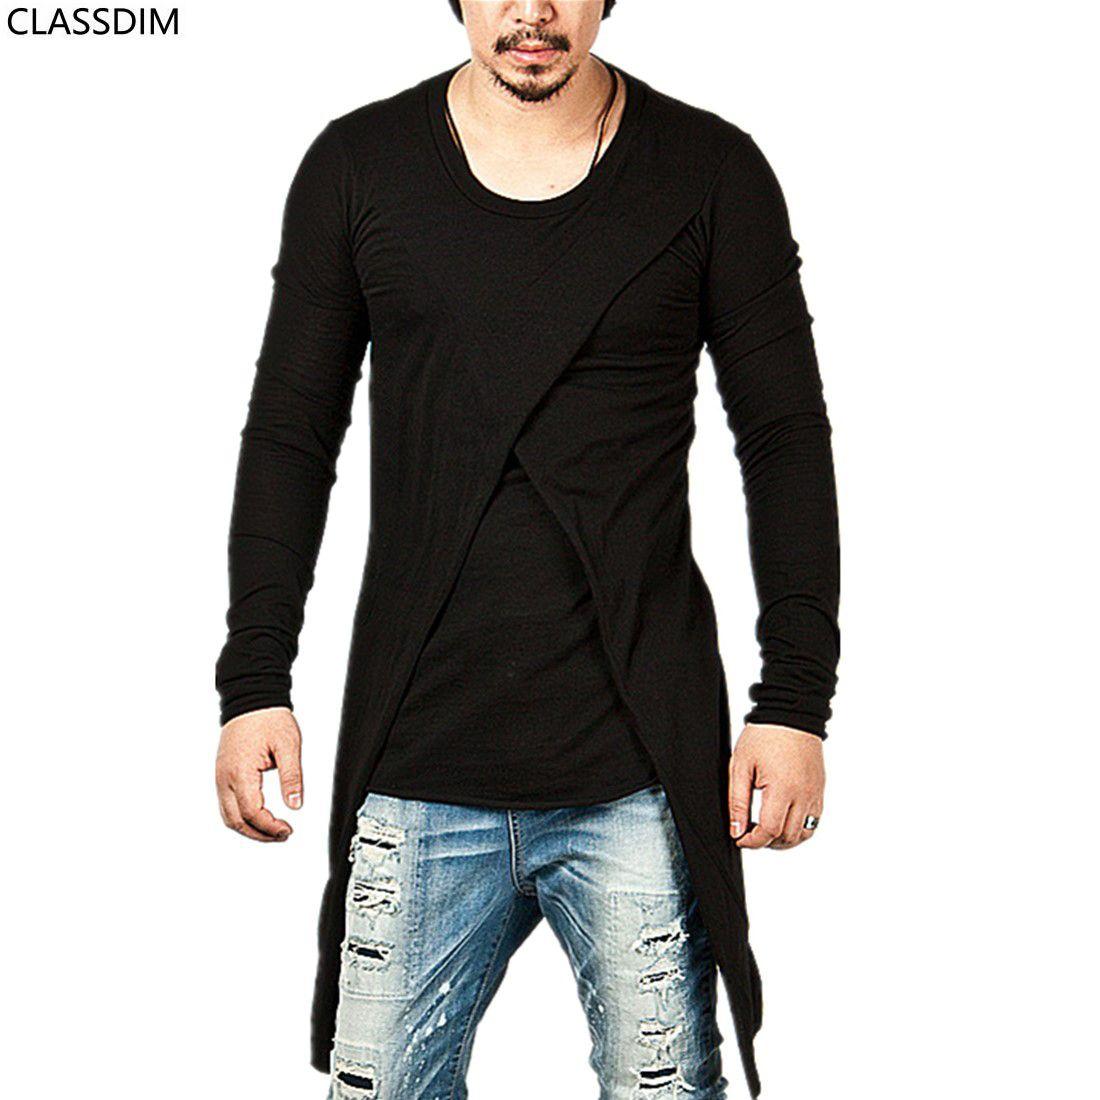 Men S Fashion Long Sleeved T Shirt Longer Section Men S Four Seasons Hip  Hop Street T Shirt Round Neck Pure Black T Shirt Size M 3XL Buy Cool Shirts  ... b453b057b8b